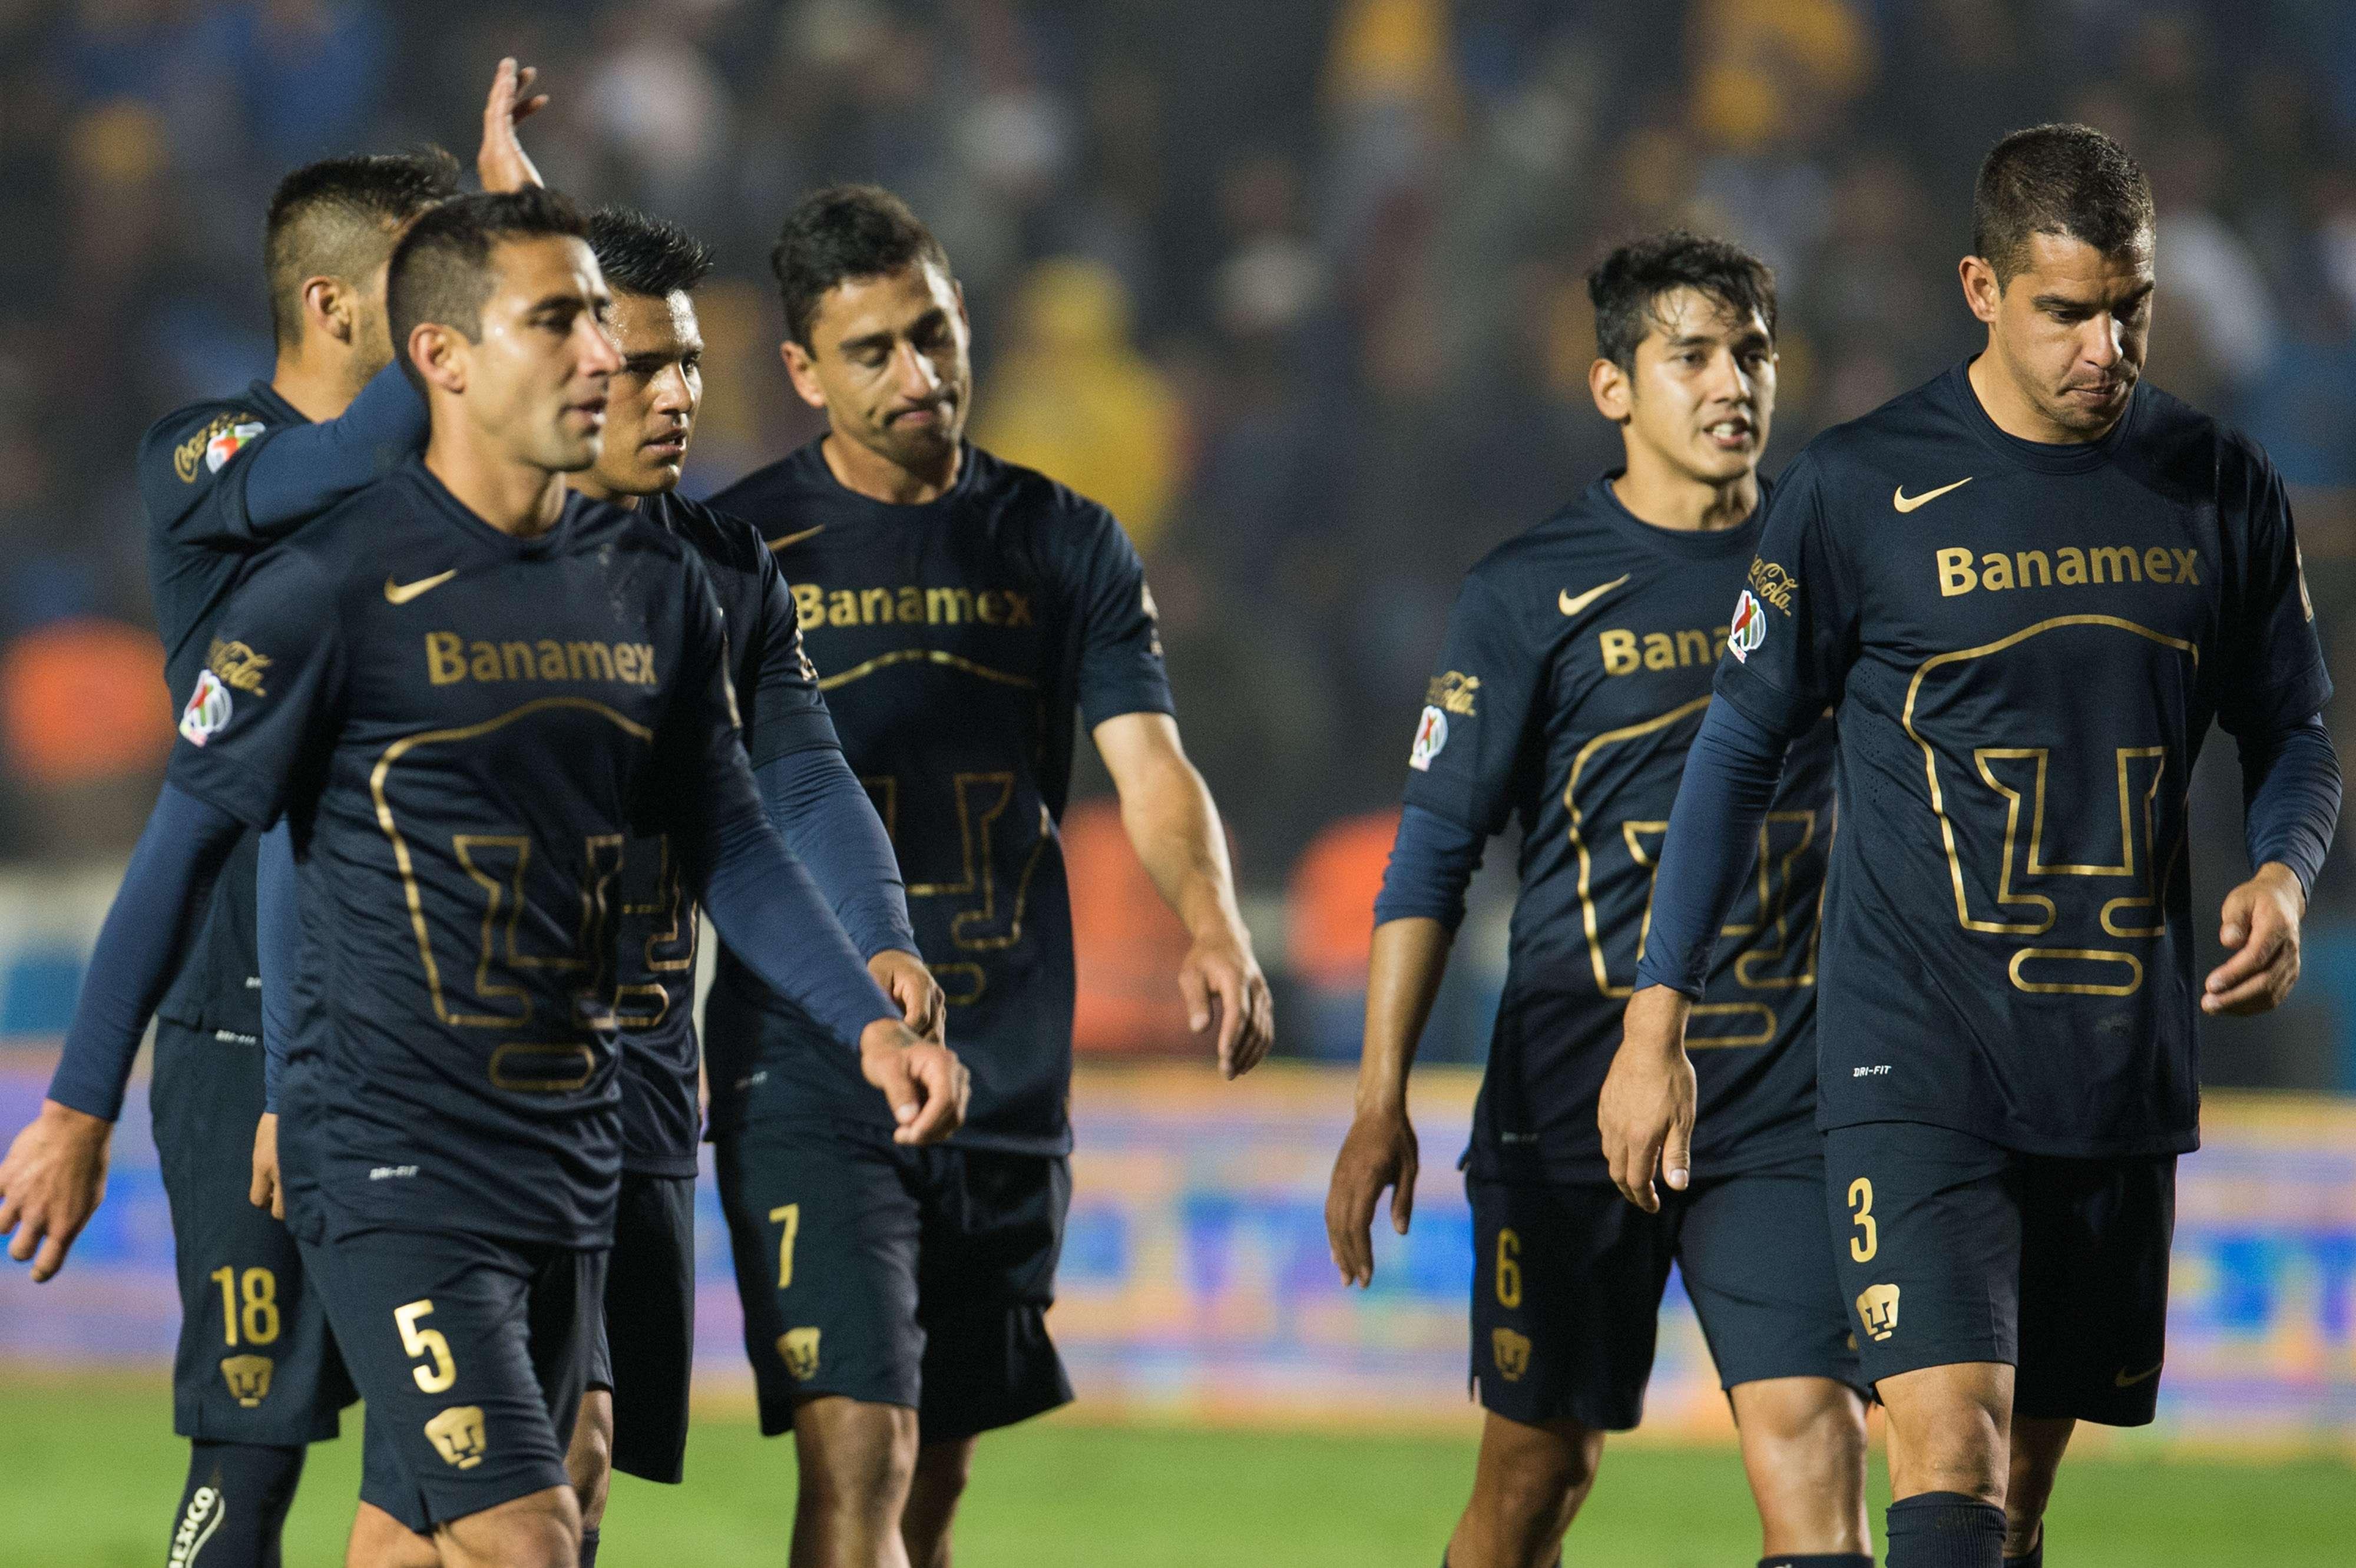 Universidad Nacional no levanta en el Clausura 2015. Foto: Mexsport